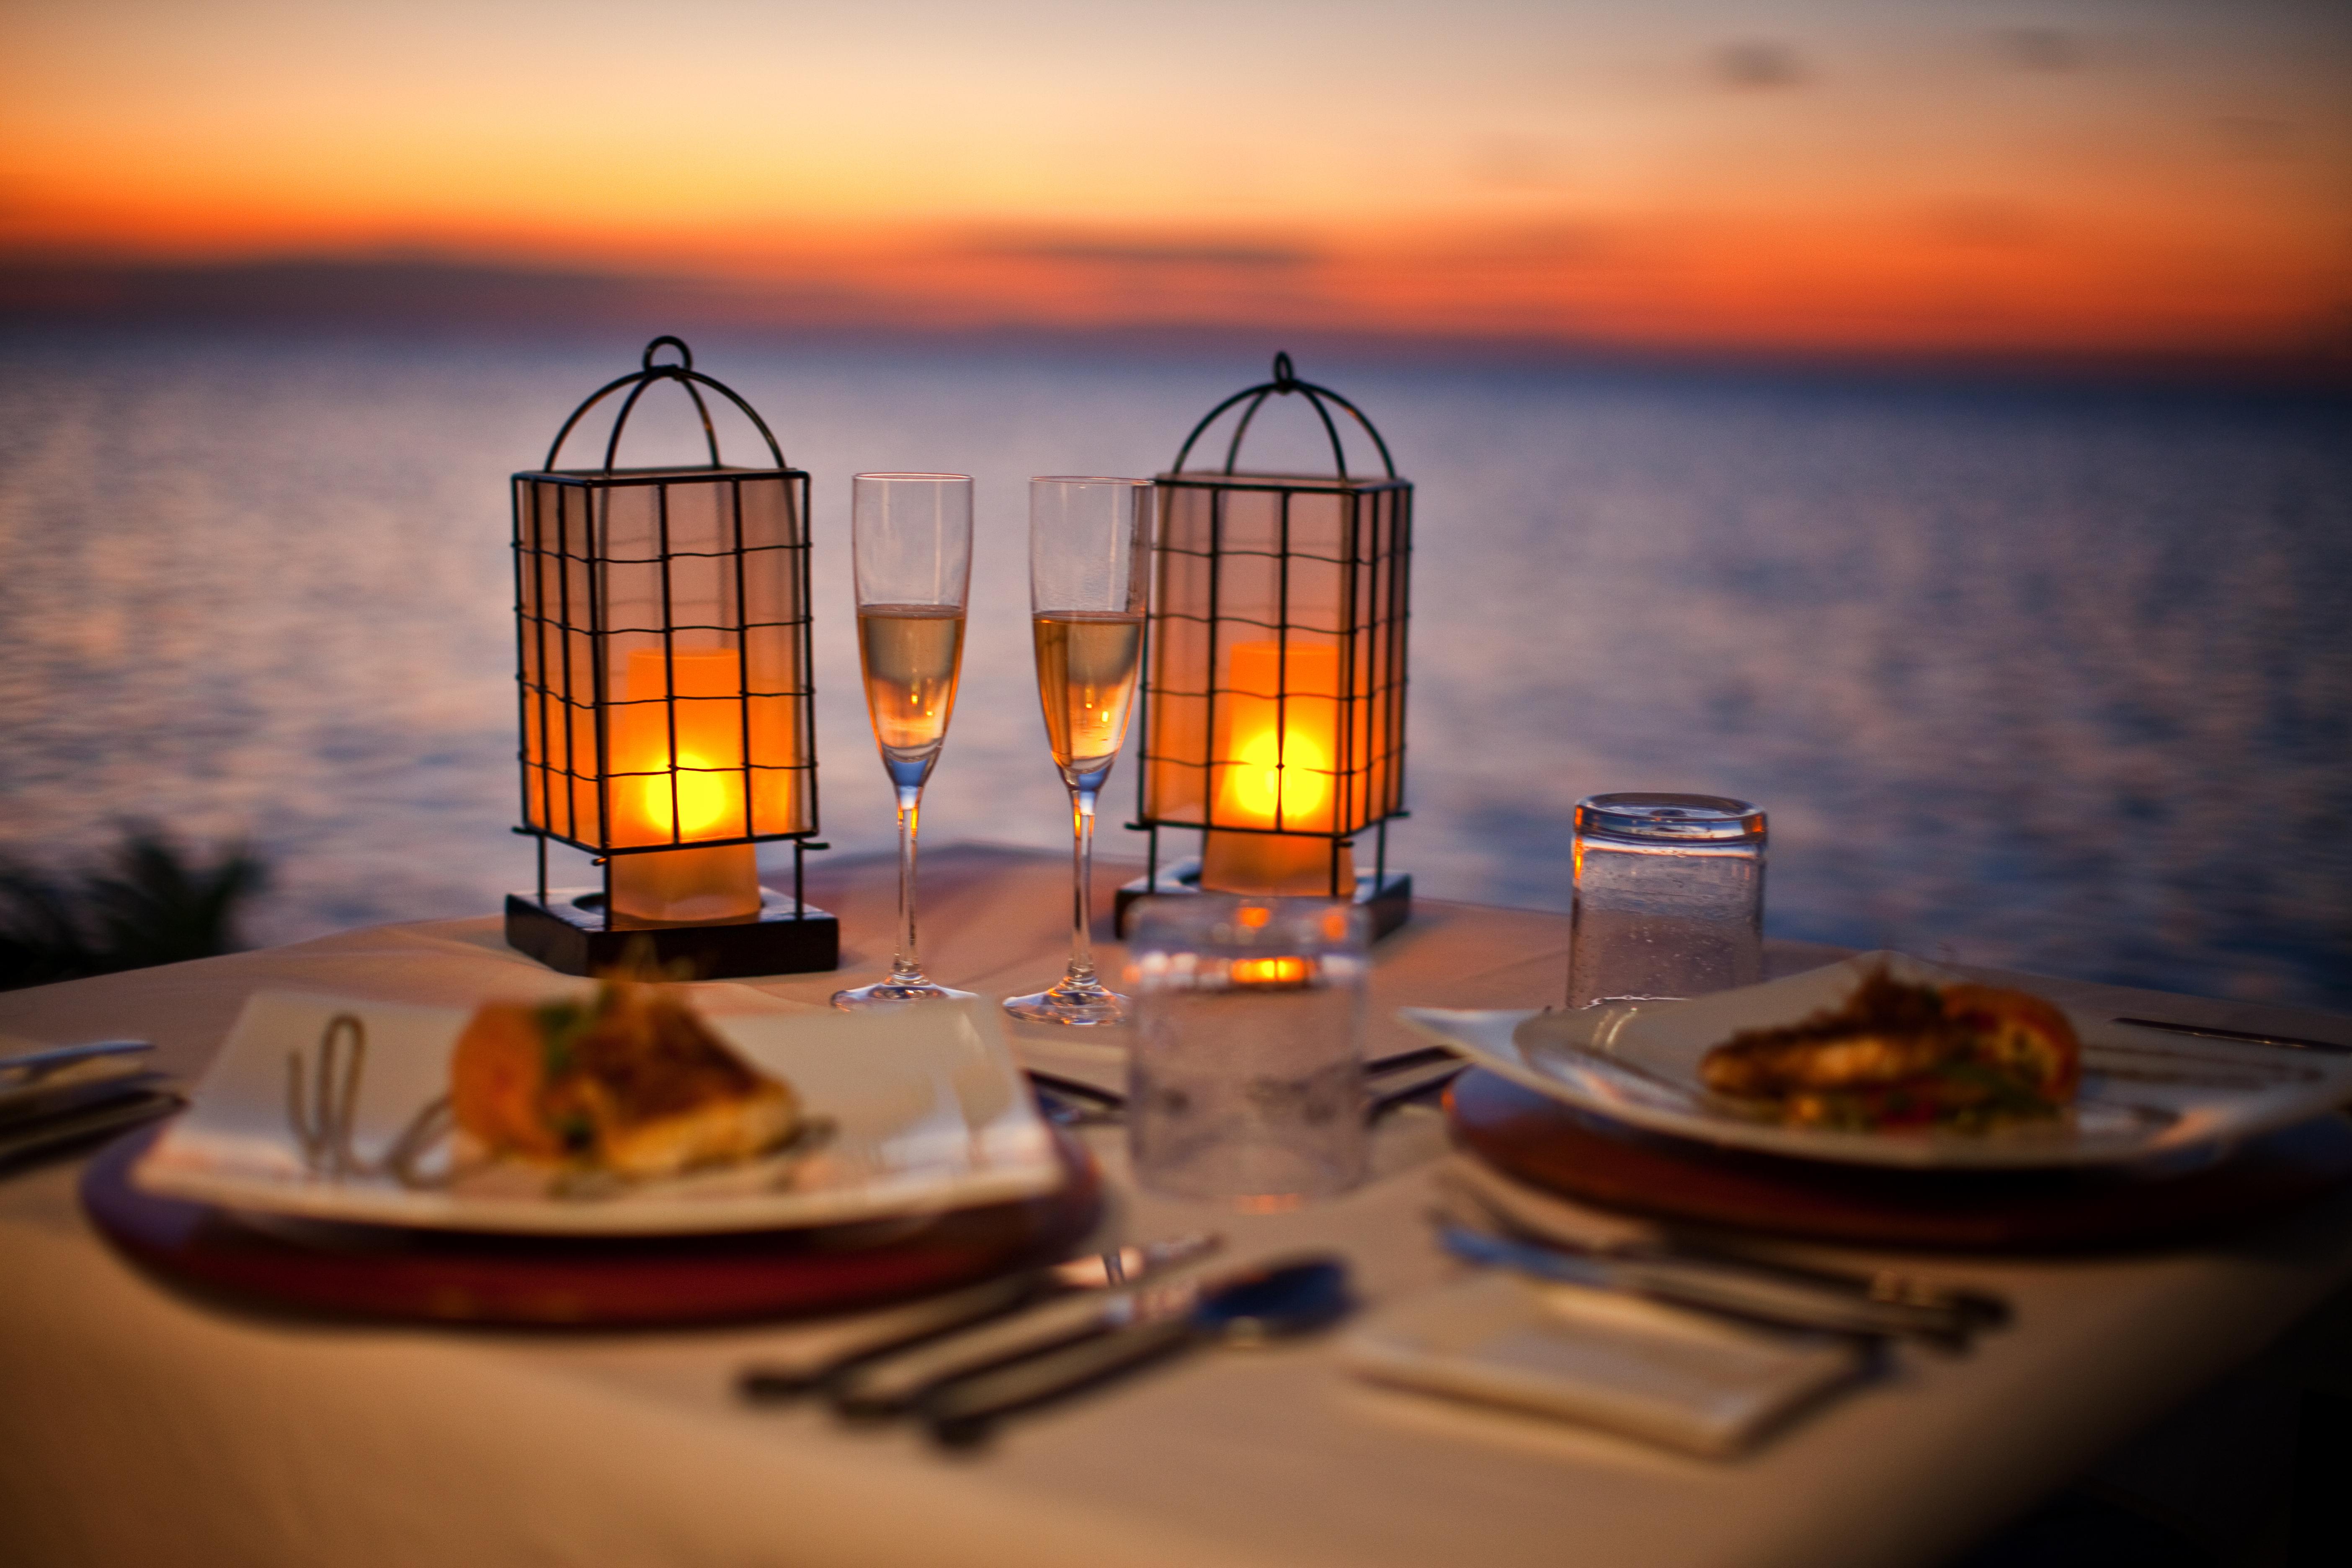 Millionaire Date Idea #1: Private Dinners